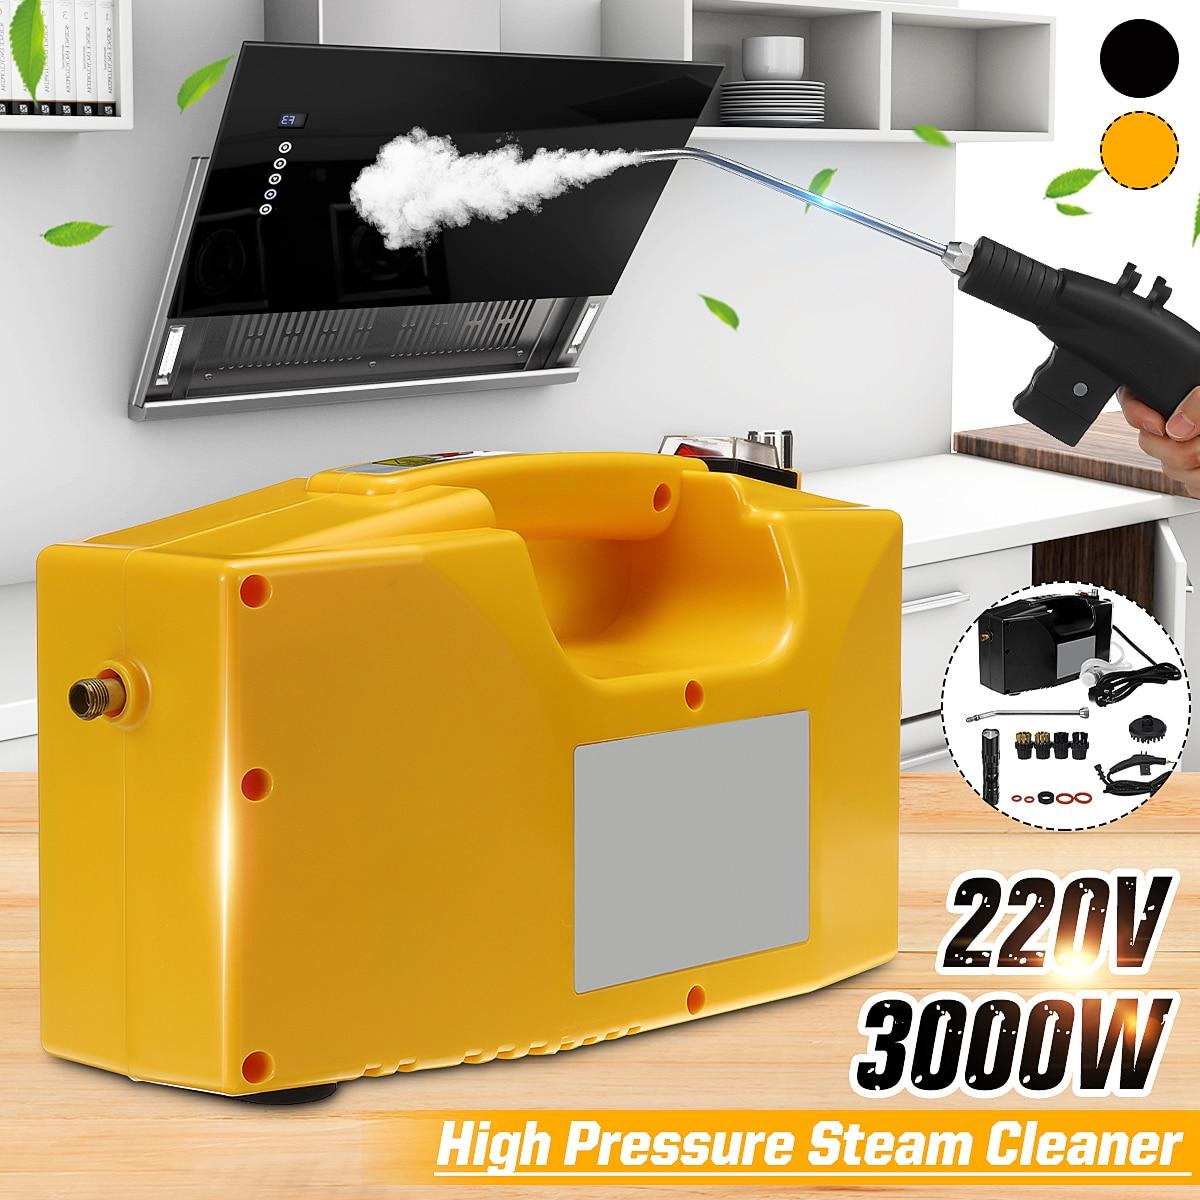 220V 3000W High Pressure Temperature Steam Cleaner Handheld Kitchen Cleaning Machine Automatic Pumping Sterilization Disinfector